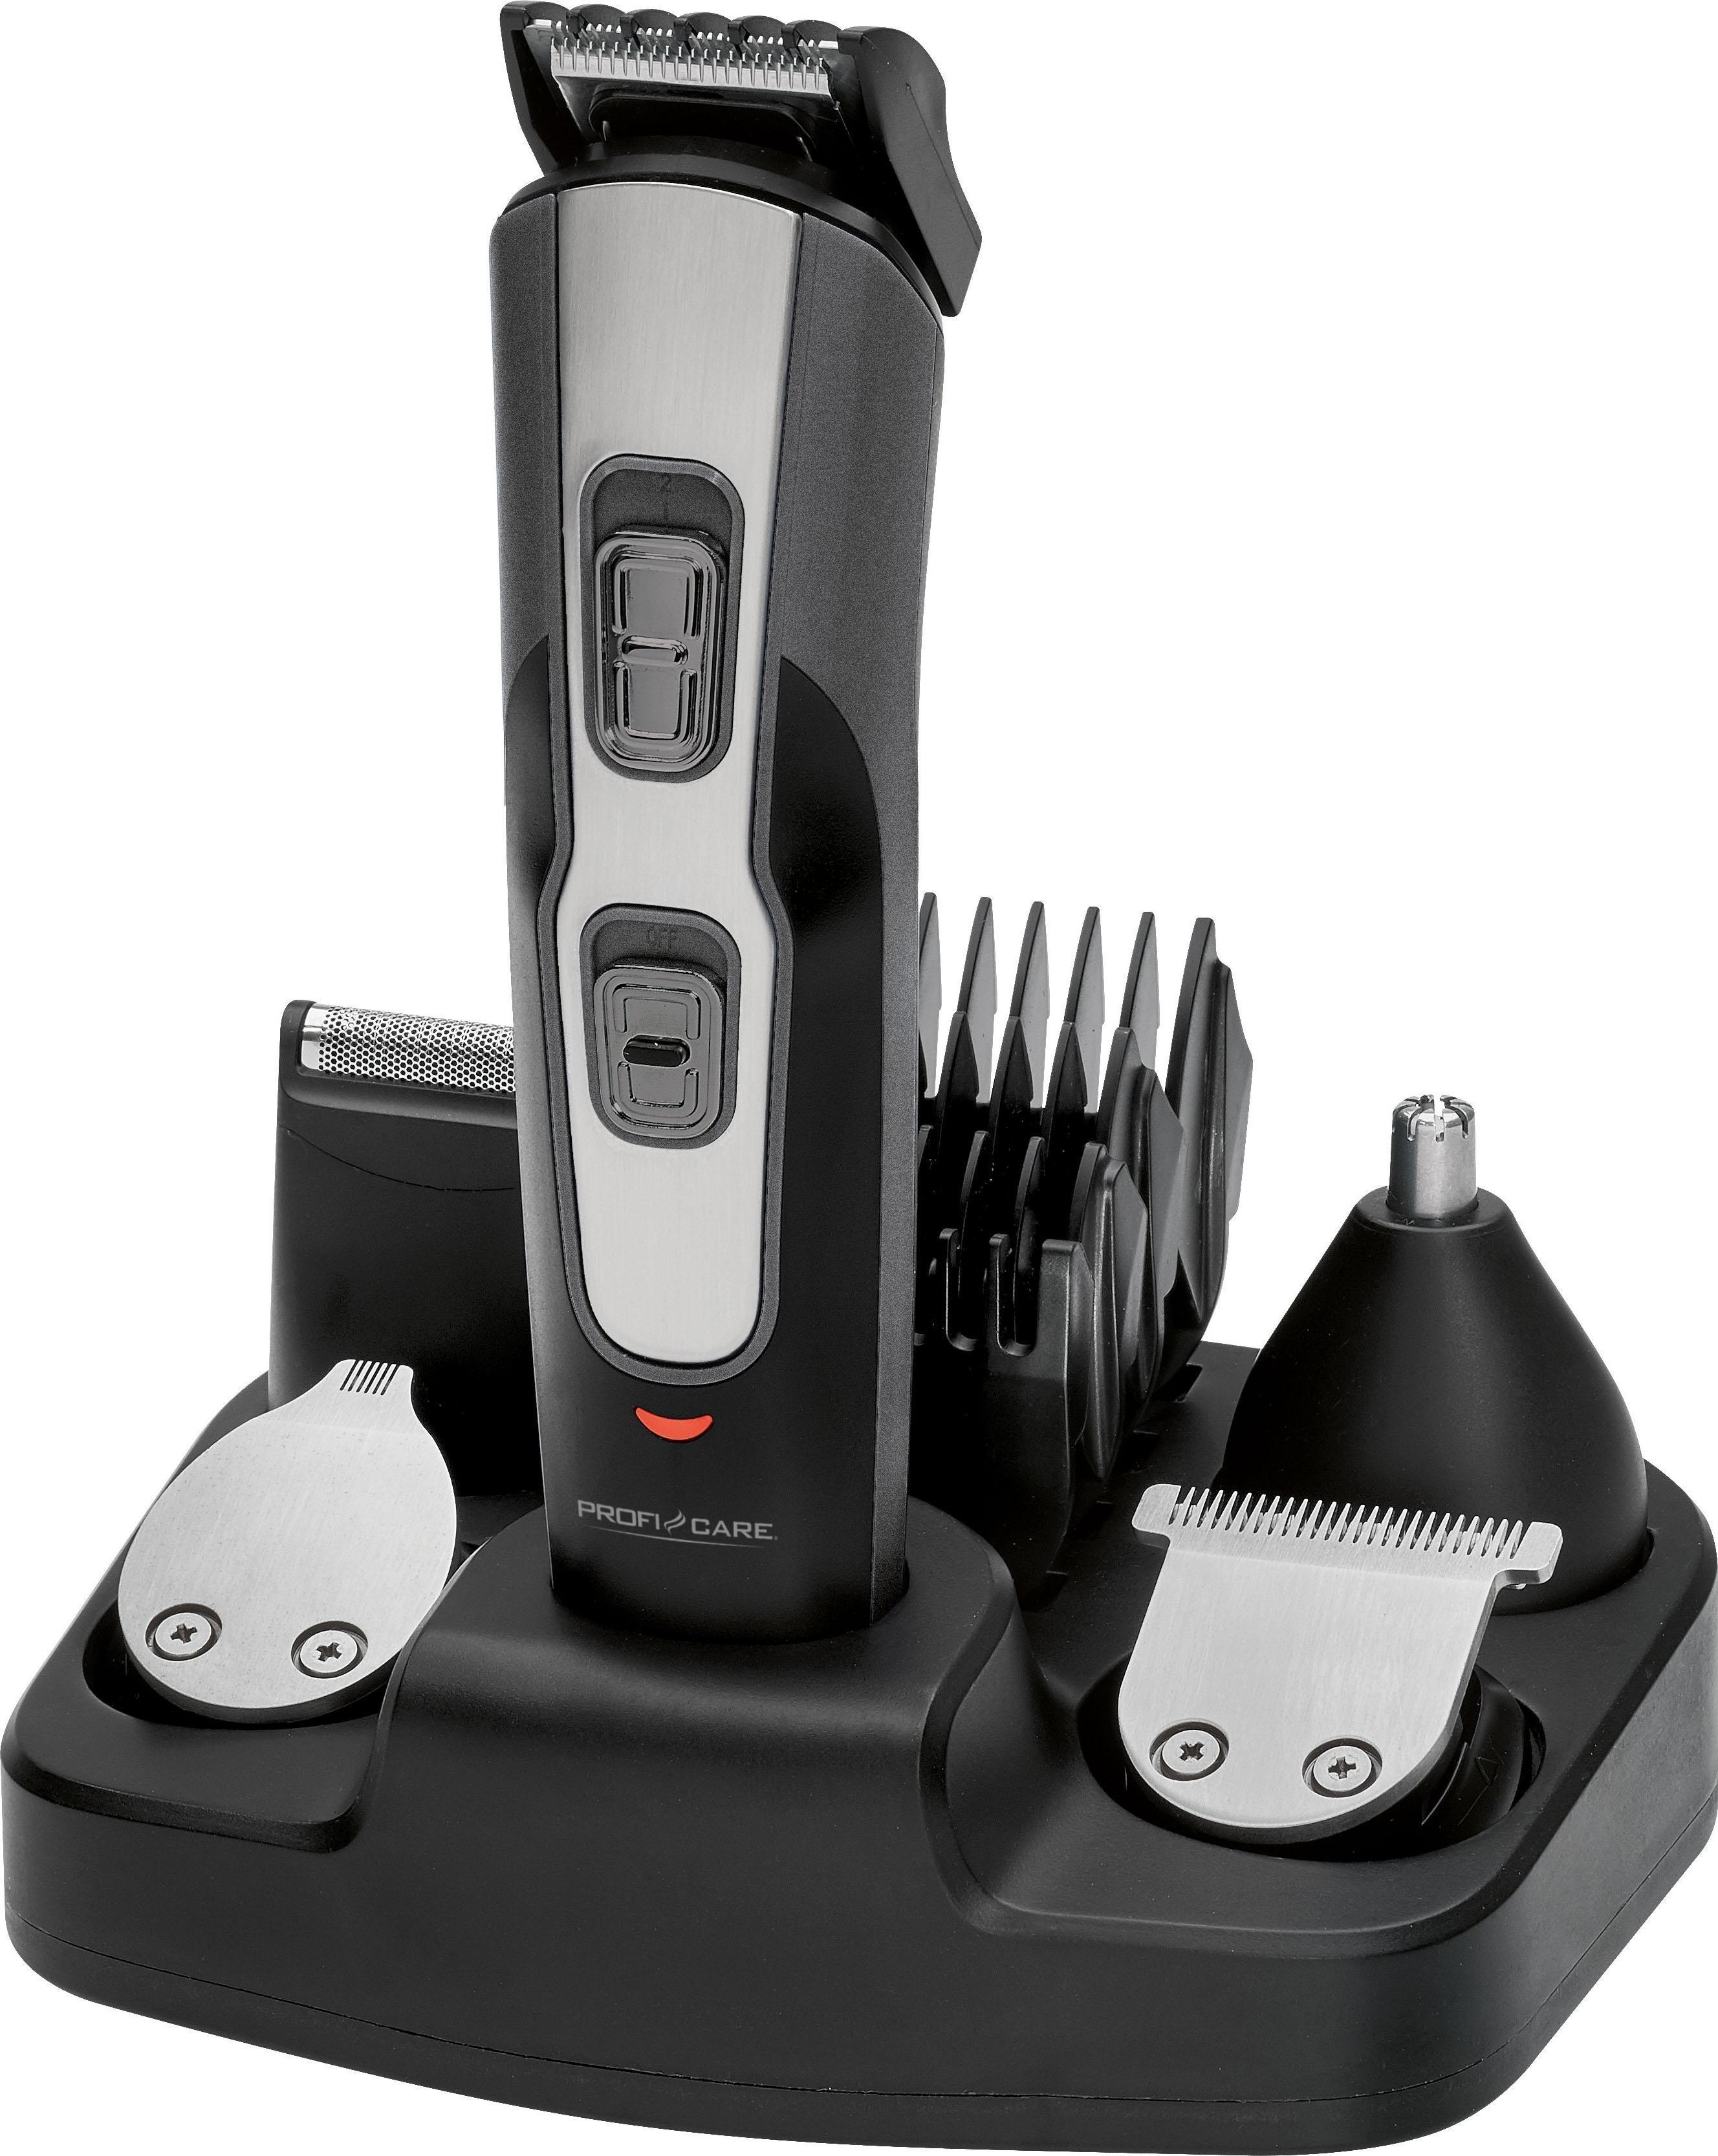 ProfiCare tondeuse PC-BHT 3014 Multifunctionele tondeuse (set) - gratis ruilen op otto.nl